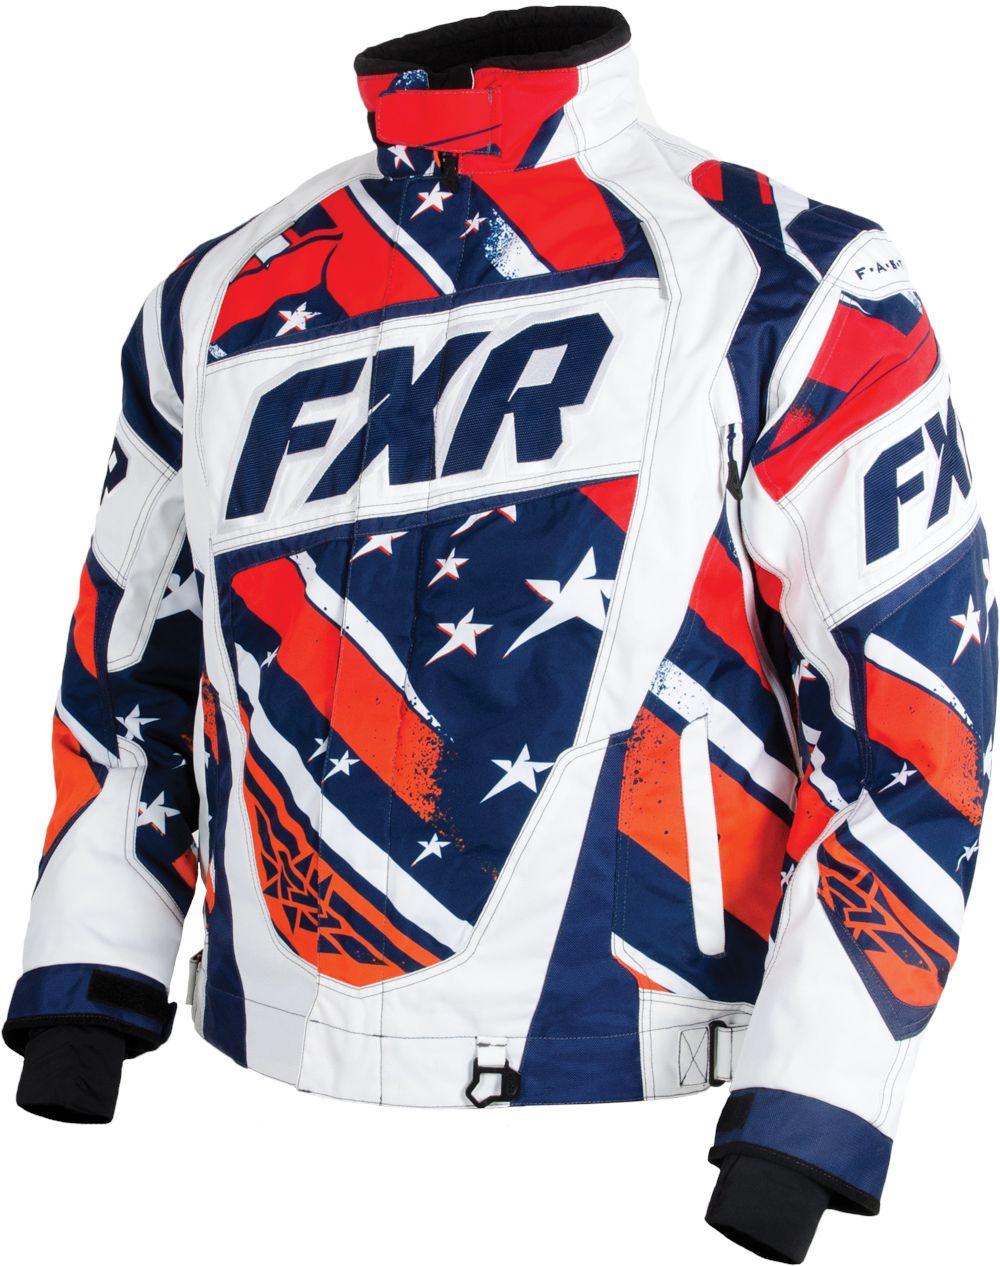 FXR Racing - 2015 Snowmobile Apparel - Men's Helix Jacket